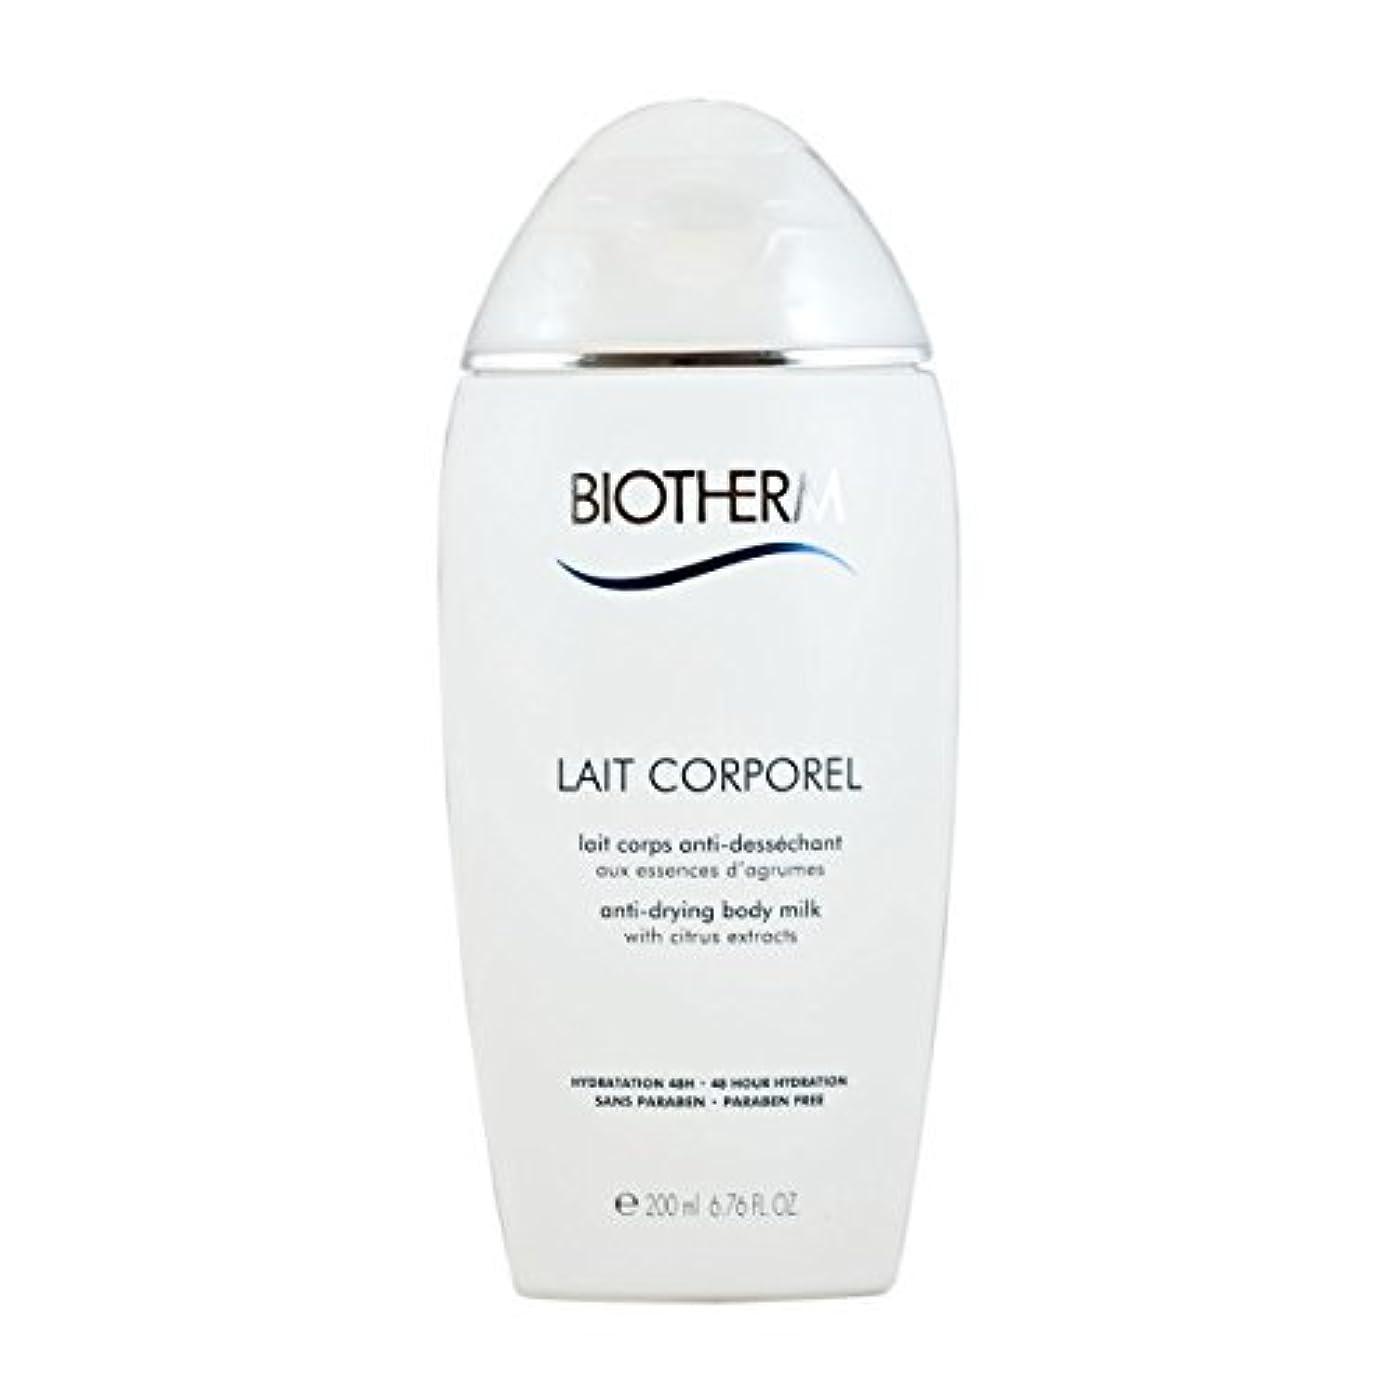 安心不完全な哲学者Biotherm Lait Corporel Anti-Drying Body Milk 6.76 Ounce [並行輸入品]